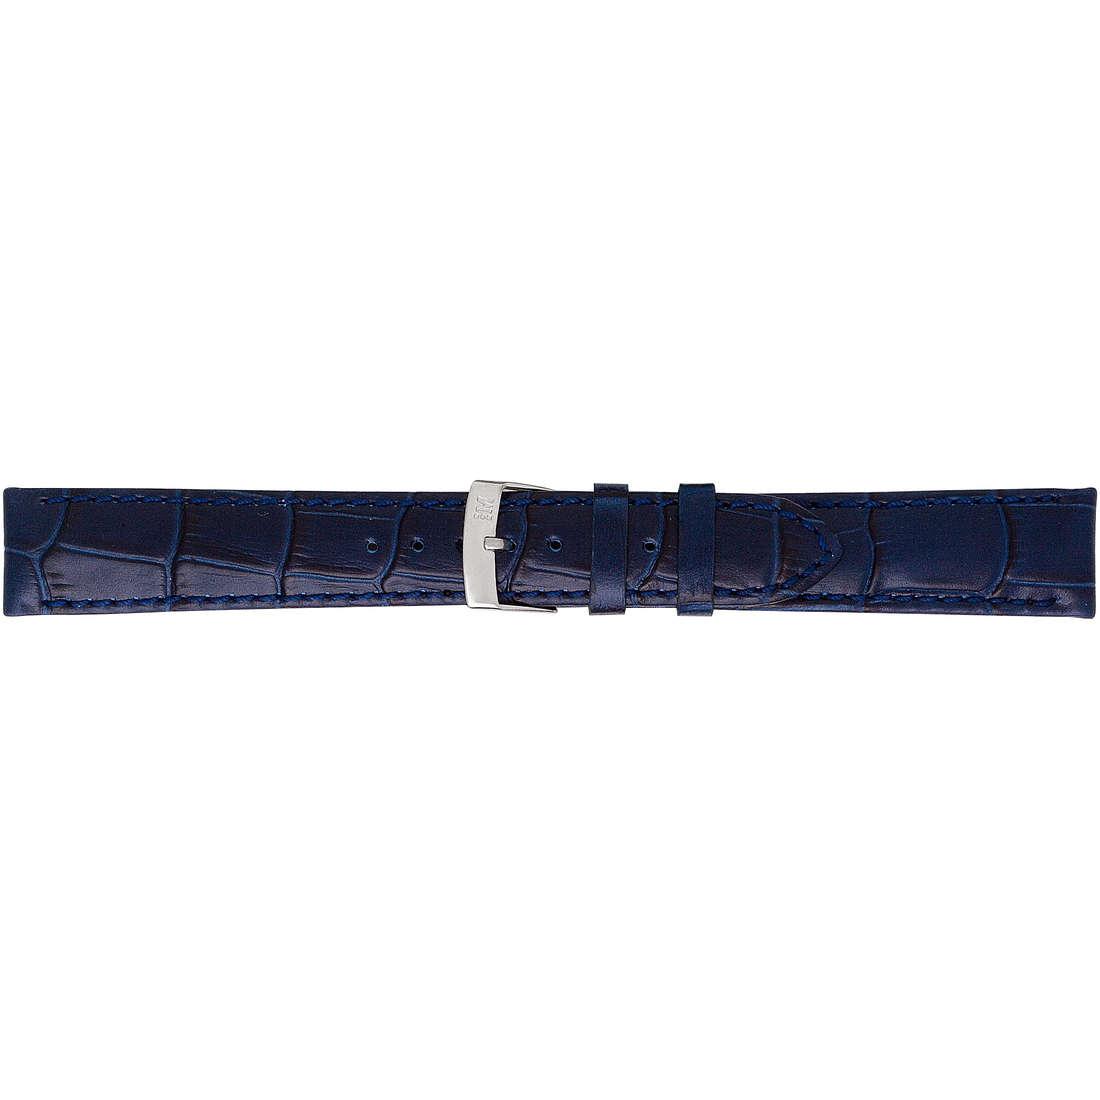 montre bande de montres homme Morellato Performance A01X2704656062CR22